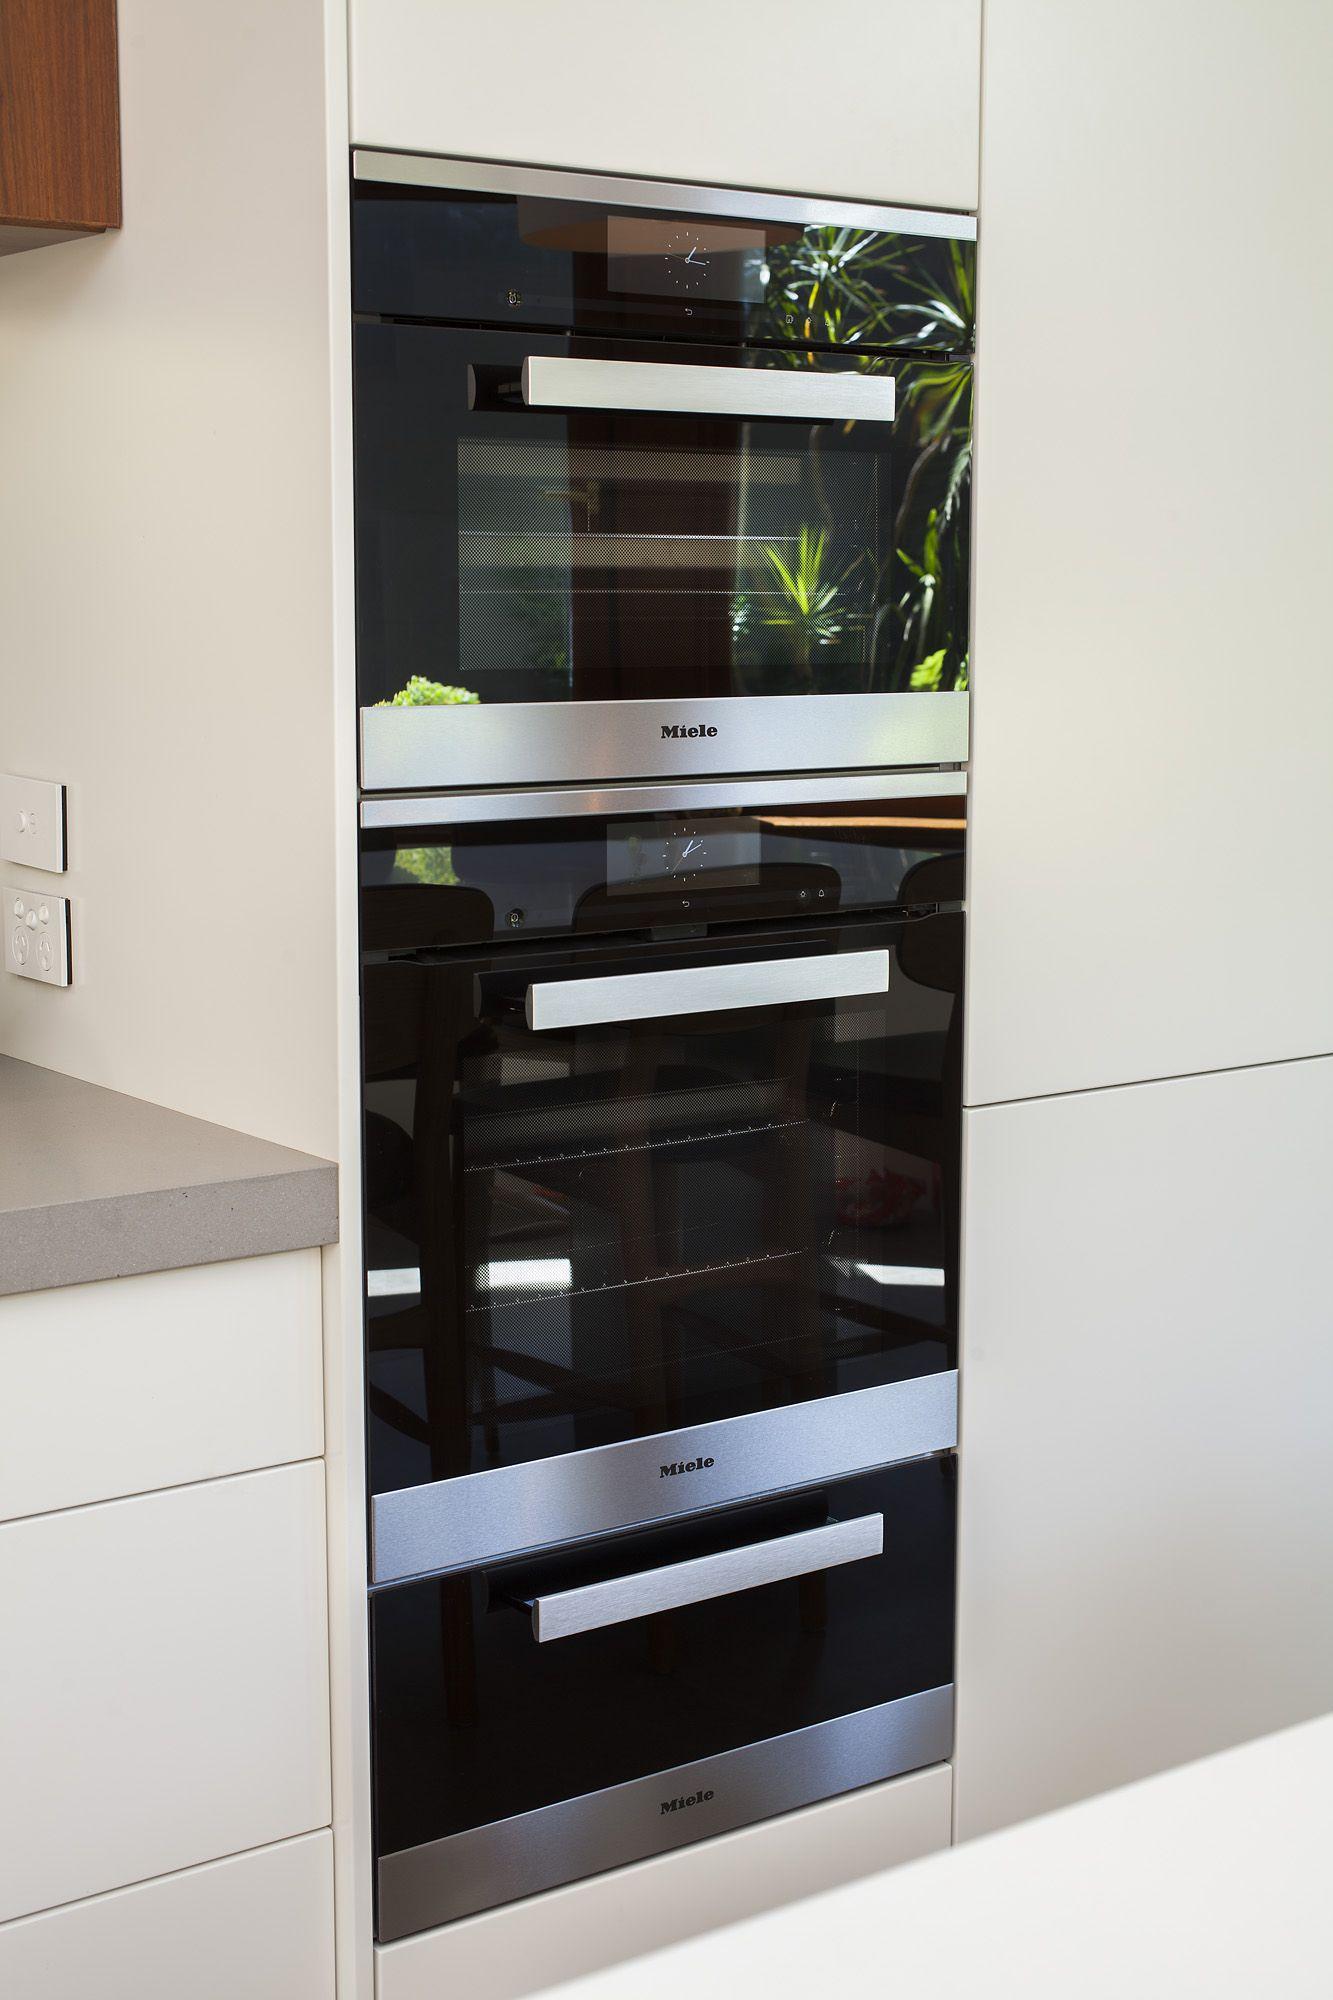 Kitchen Appliance Layout One Wall